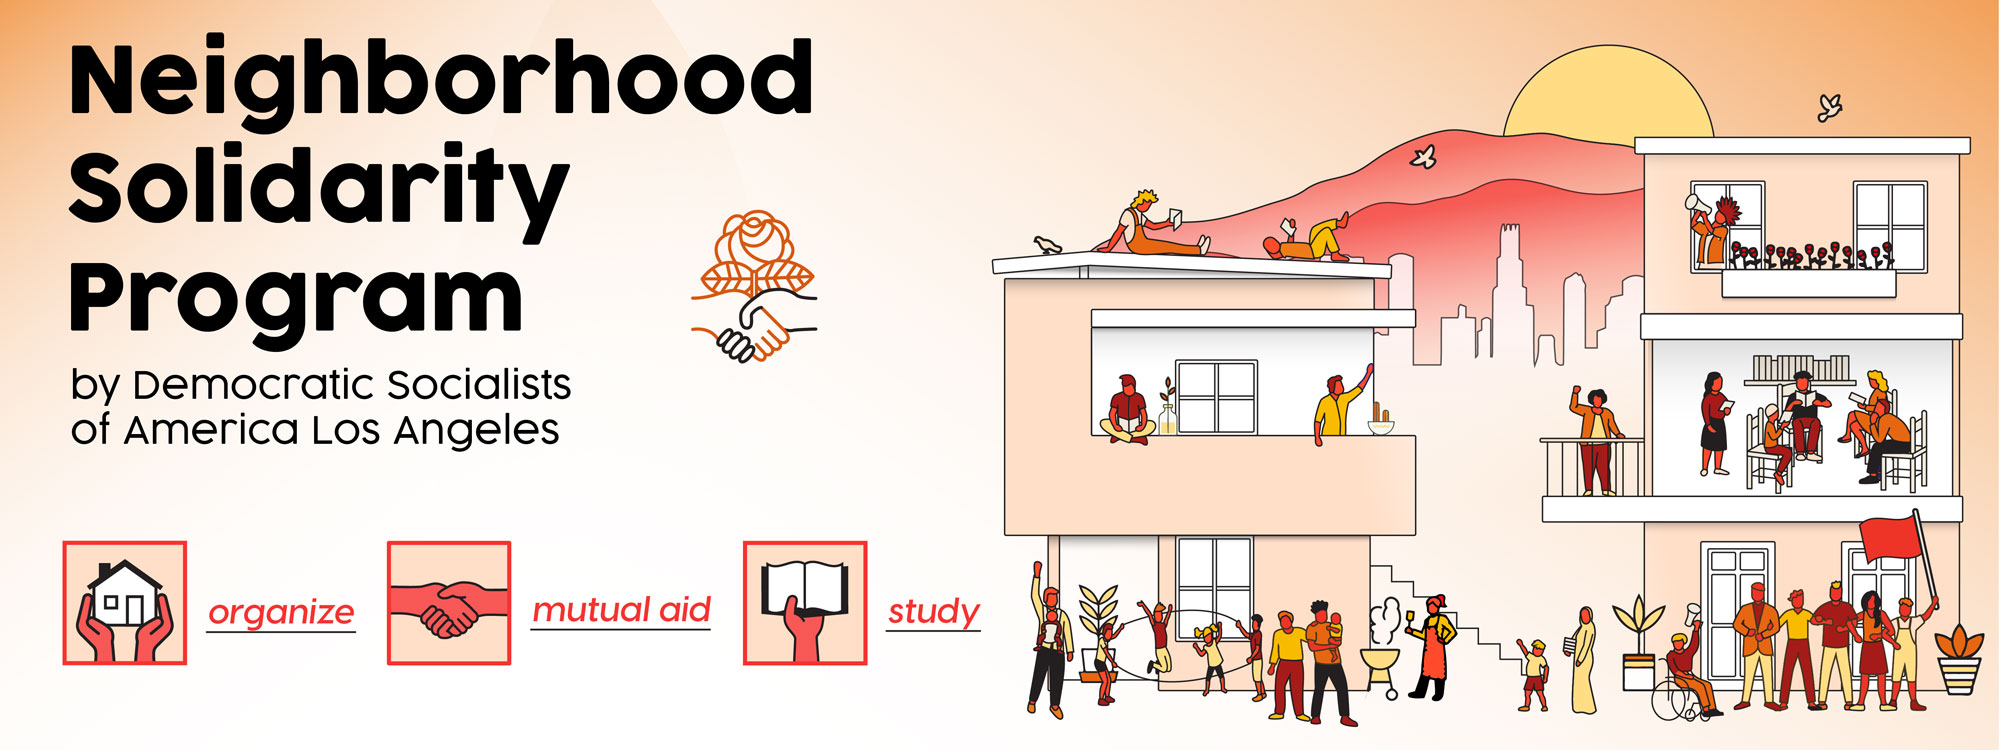 Neighborhood Solidarity Program: By Democratic Socialists of America Los Angeles